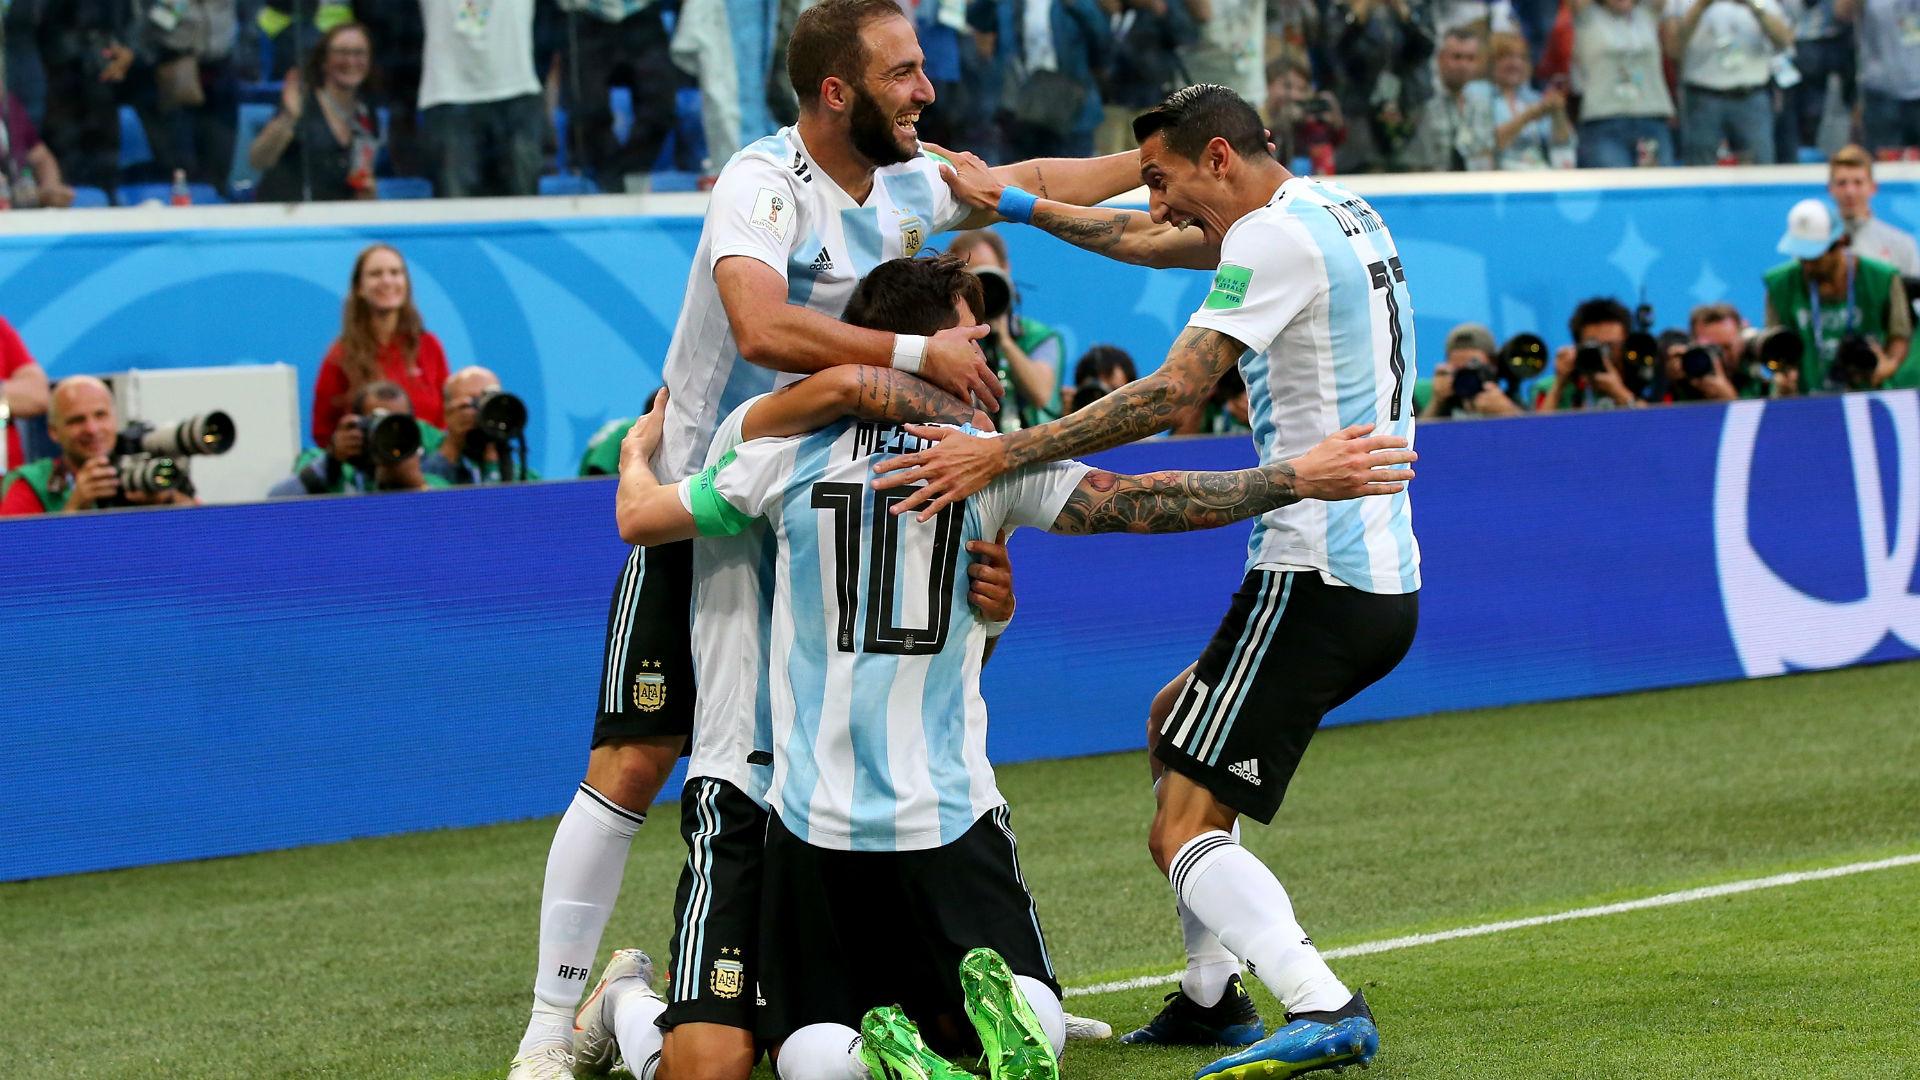 Higuain Messi Di Maria Argentina Nigeria World Cup Russi 2018 26062018